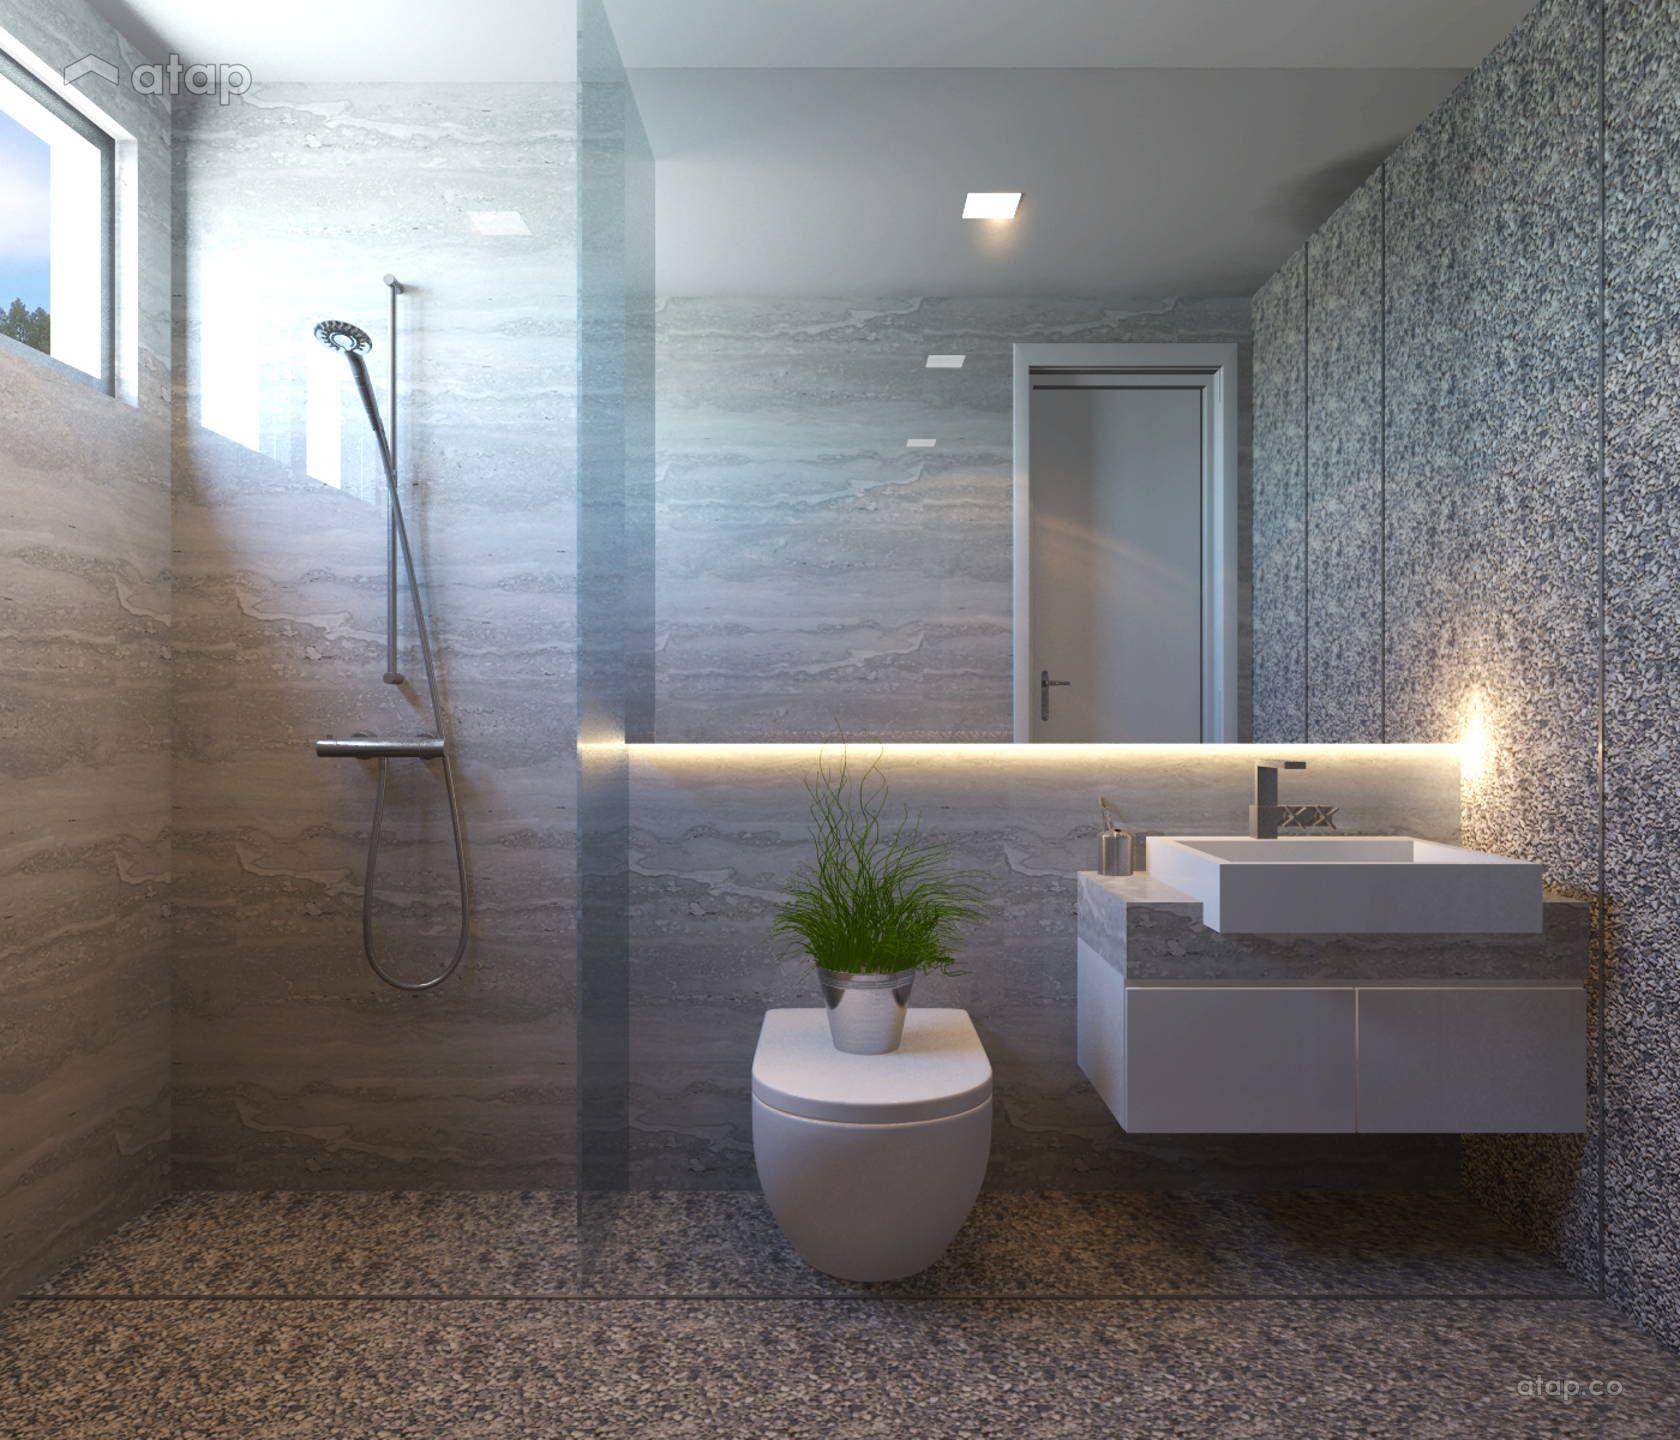 Minimalistic Modern Bathroom Bungalow Design Ideas Photos Malaysia Atap Co Modern Bathroom Design My Room